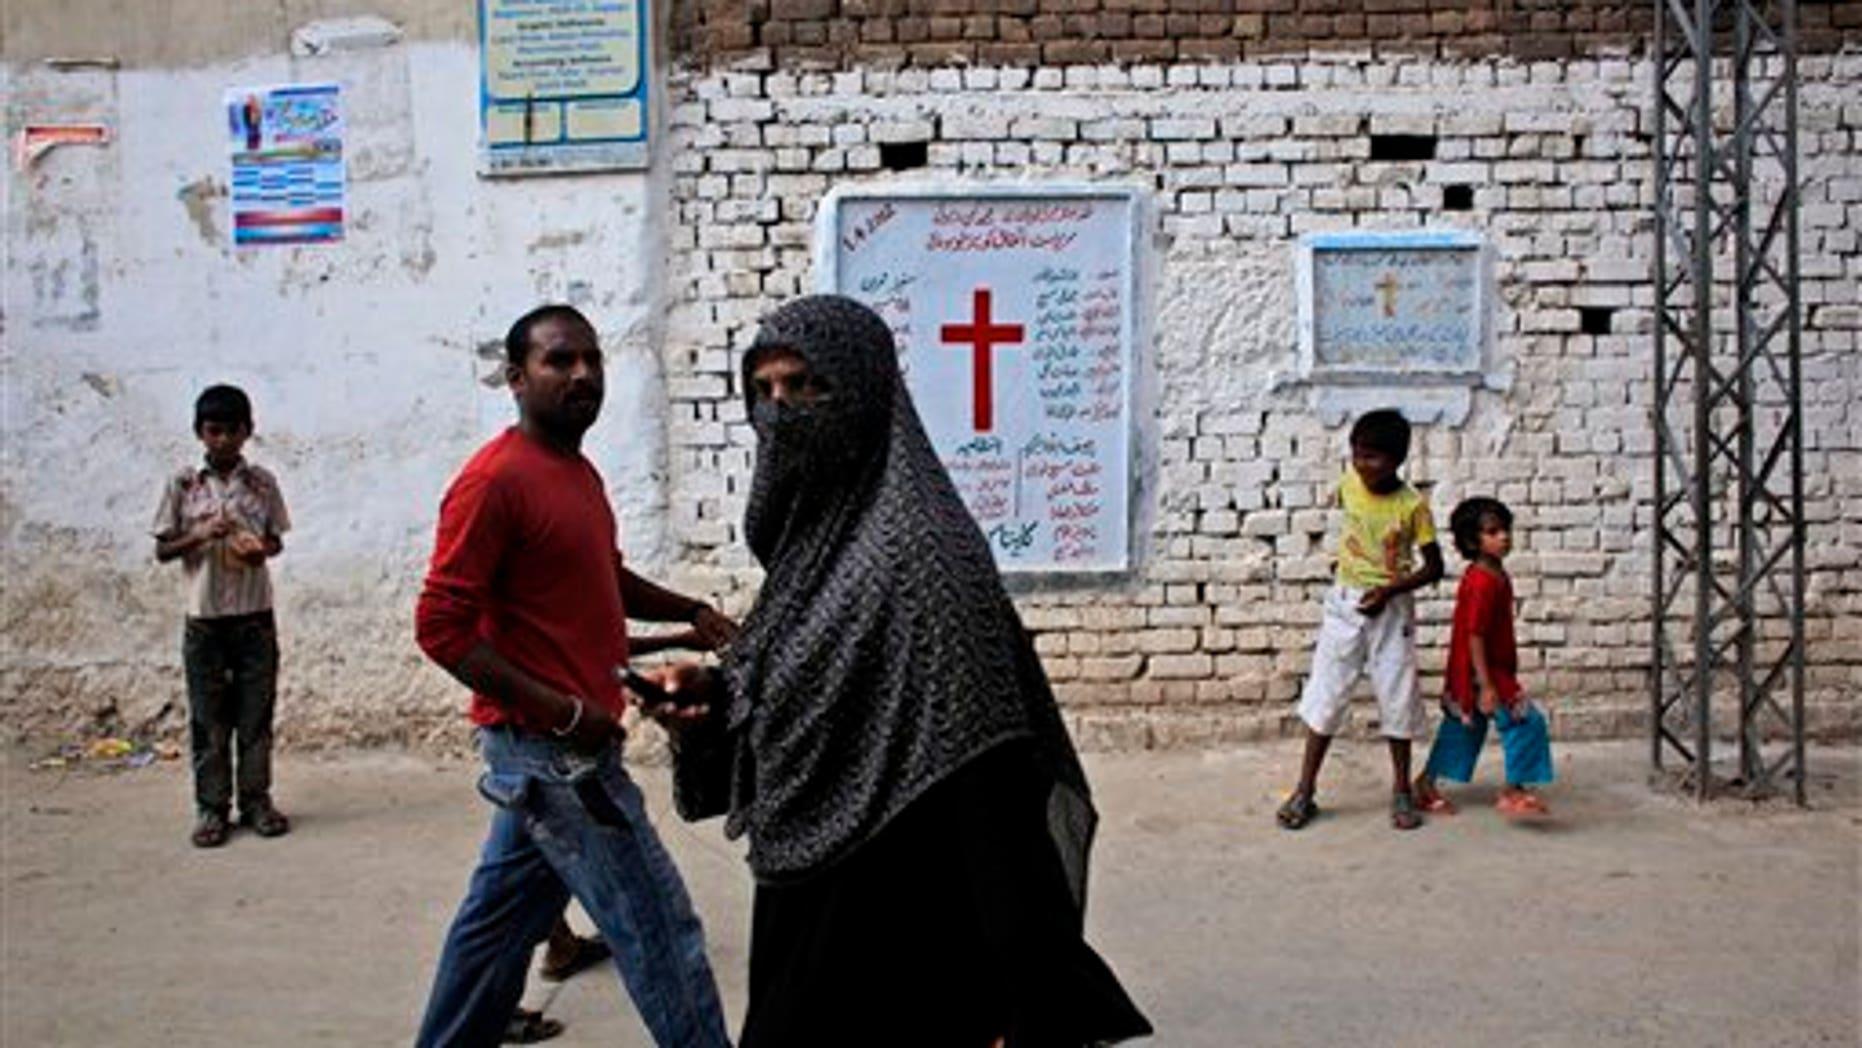 Aug. 30, 2012: Pakistanis walk in a Christian neighborhood in Islamabad, Pakistan.